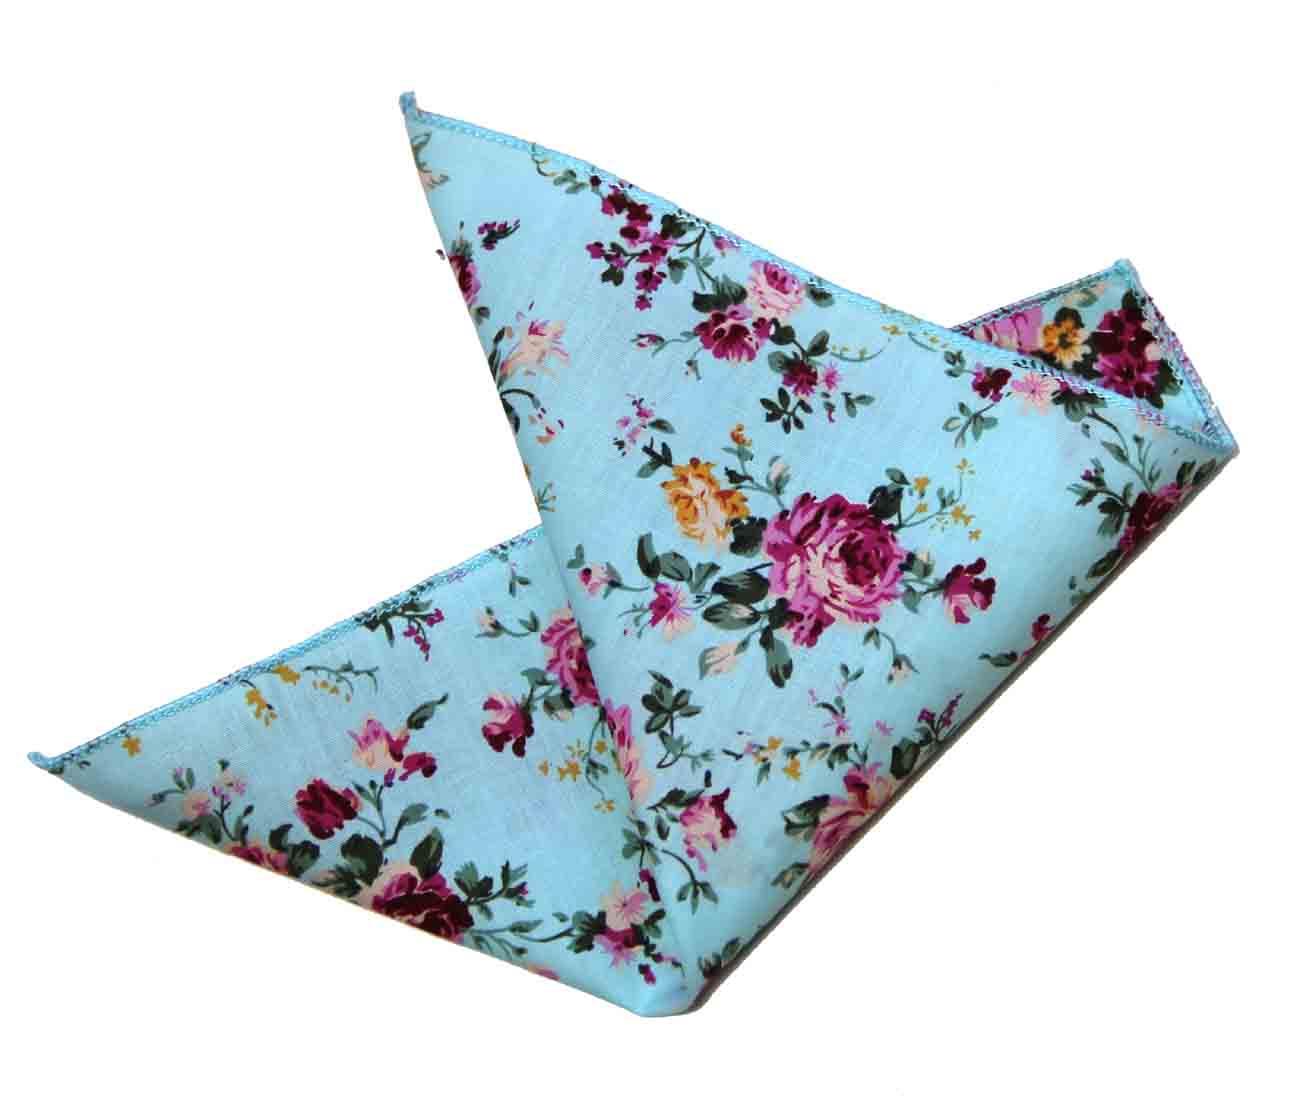 Gascoigne Pocket Square Floral Blue Pink White Yellow Cotton Men's